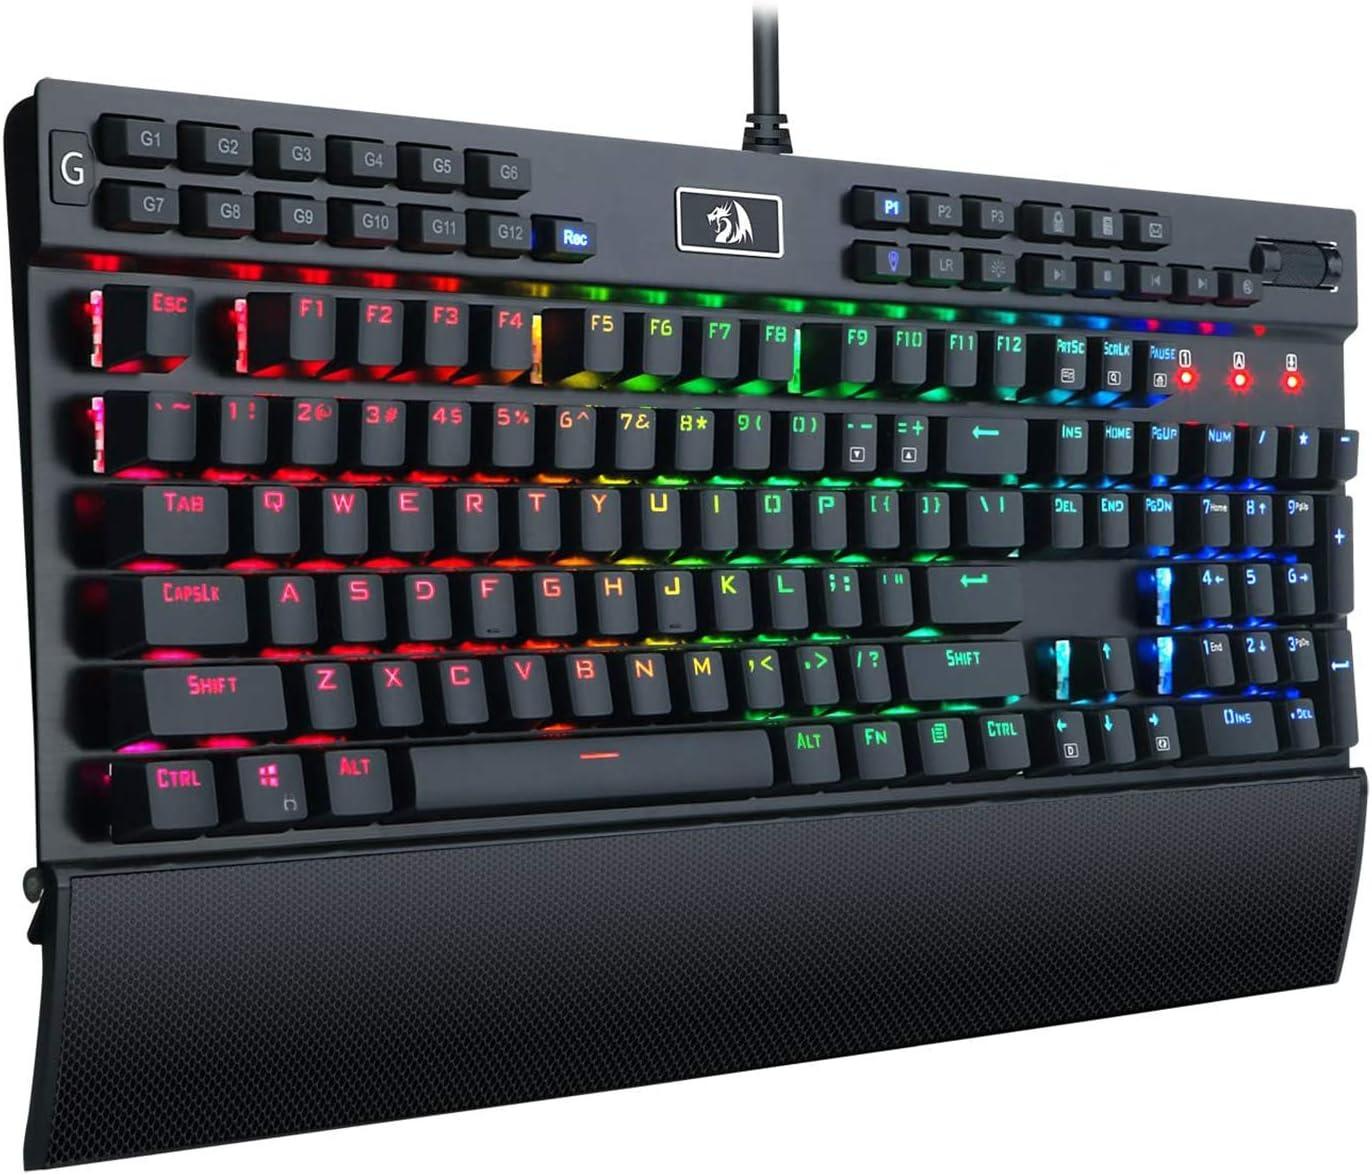 Redragon K550-SPS YAMA, Teclado Mecánico Gaming, RGB, Aluminio, Switches Outemu Purple, Rueda de volumen, reposamuñecas, Puerto USB, 12 Teclas Configurables, Distribución España - Negro - PC Windows